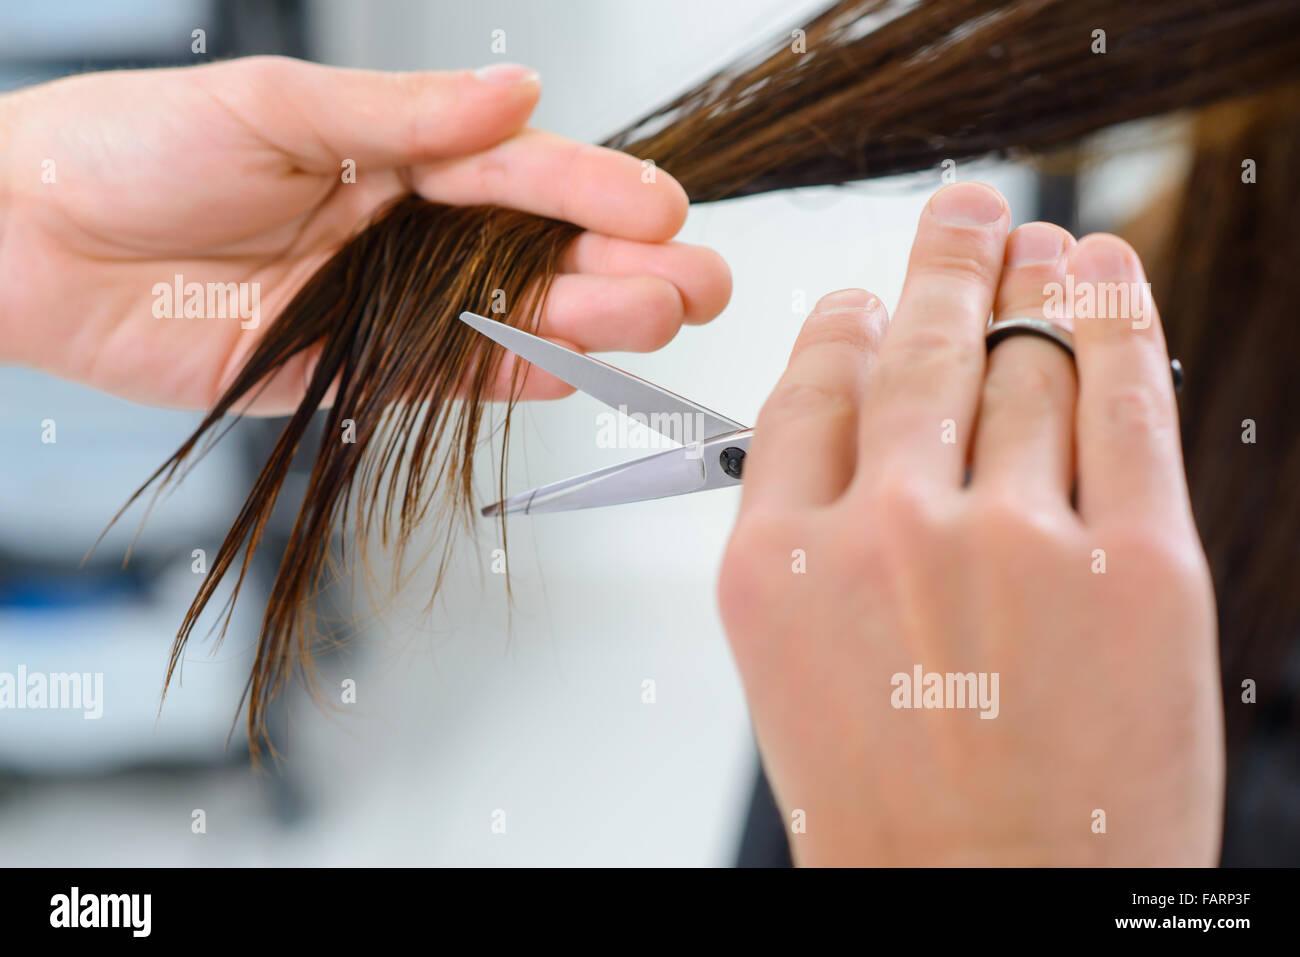 Hair trimming procedure in progress. - Stock Image